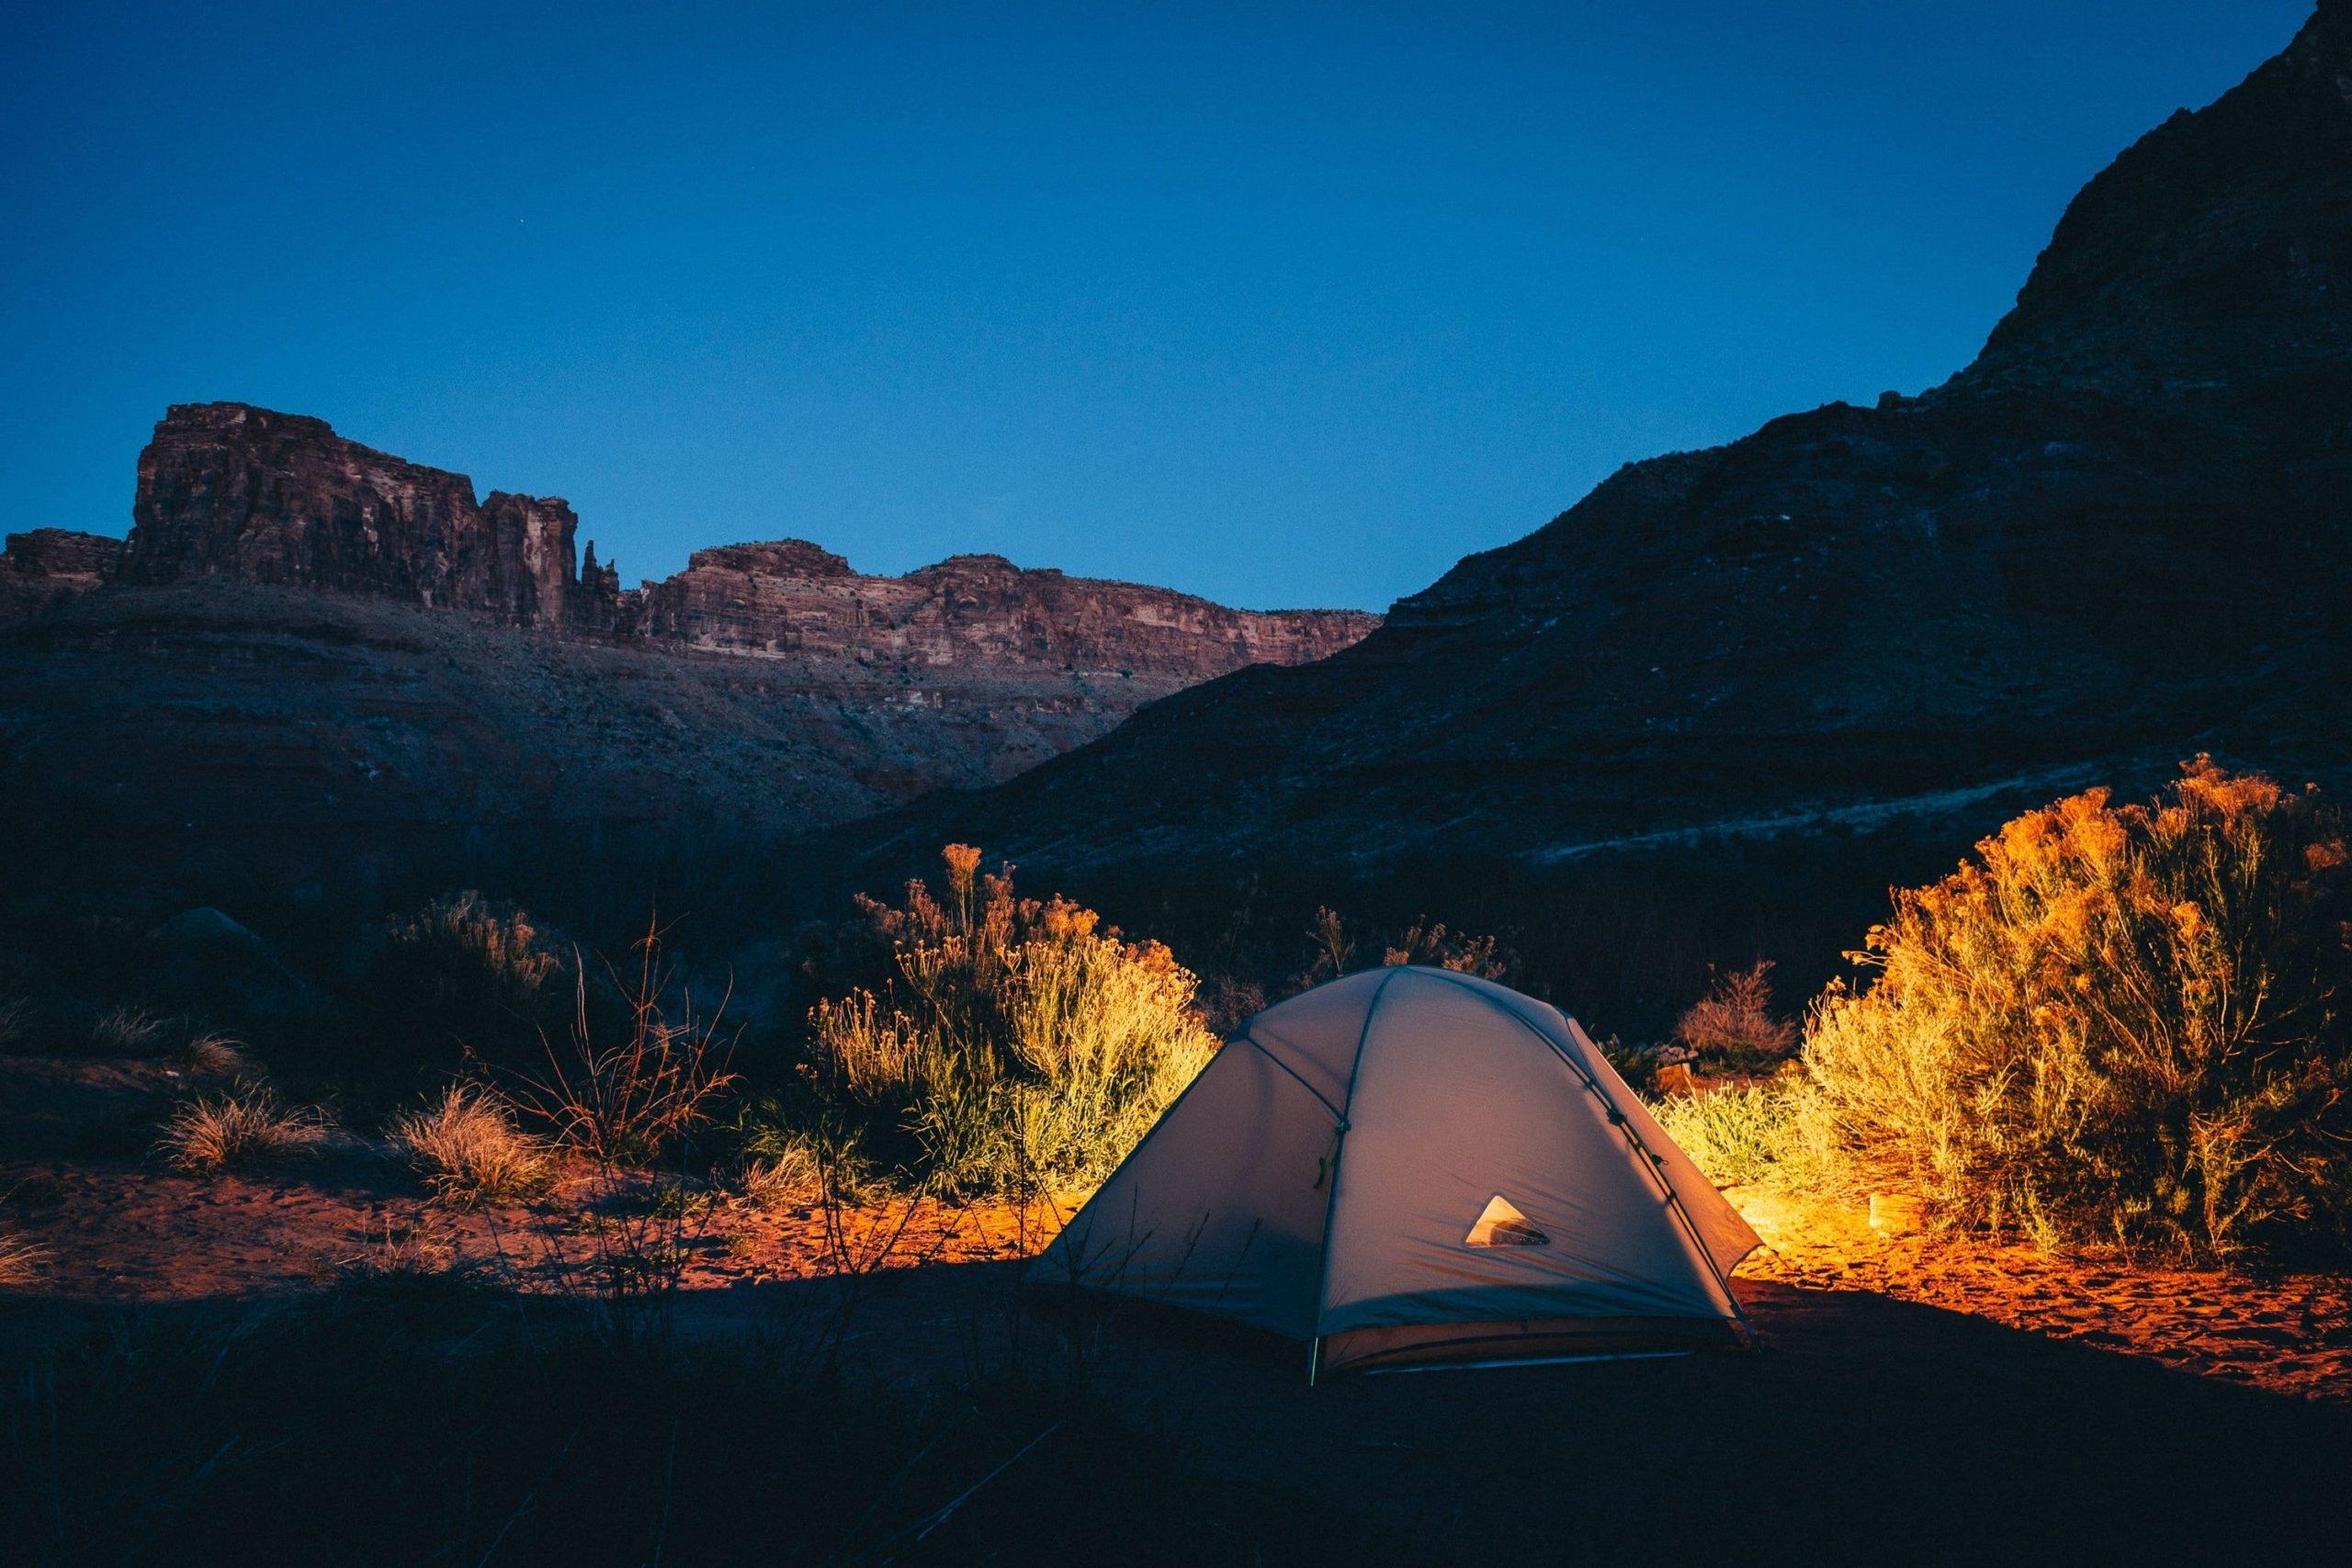 A tent set outdoors